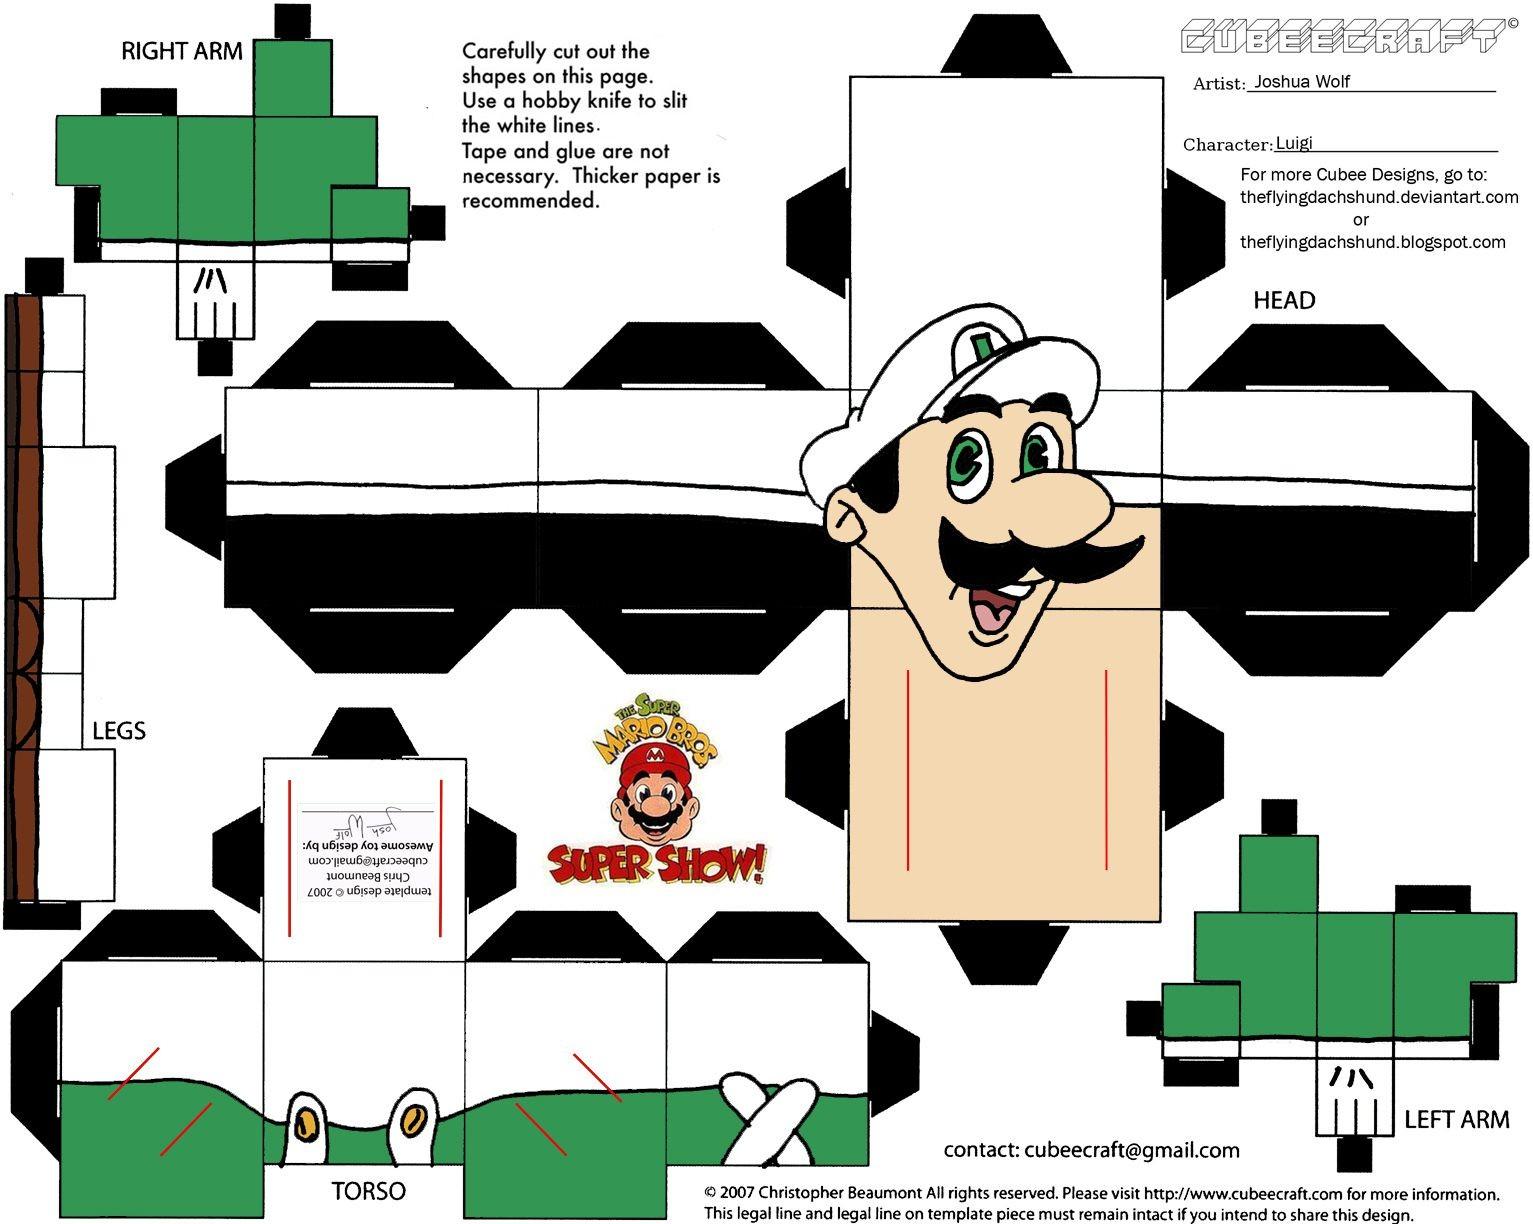 Luigi Papercraft Vg 5 Fireball Luigi Cubee by theflyingdachshund On Deviantart